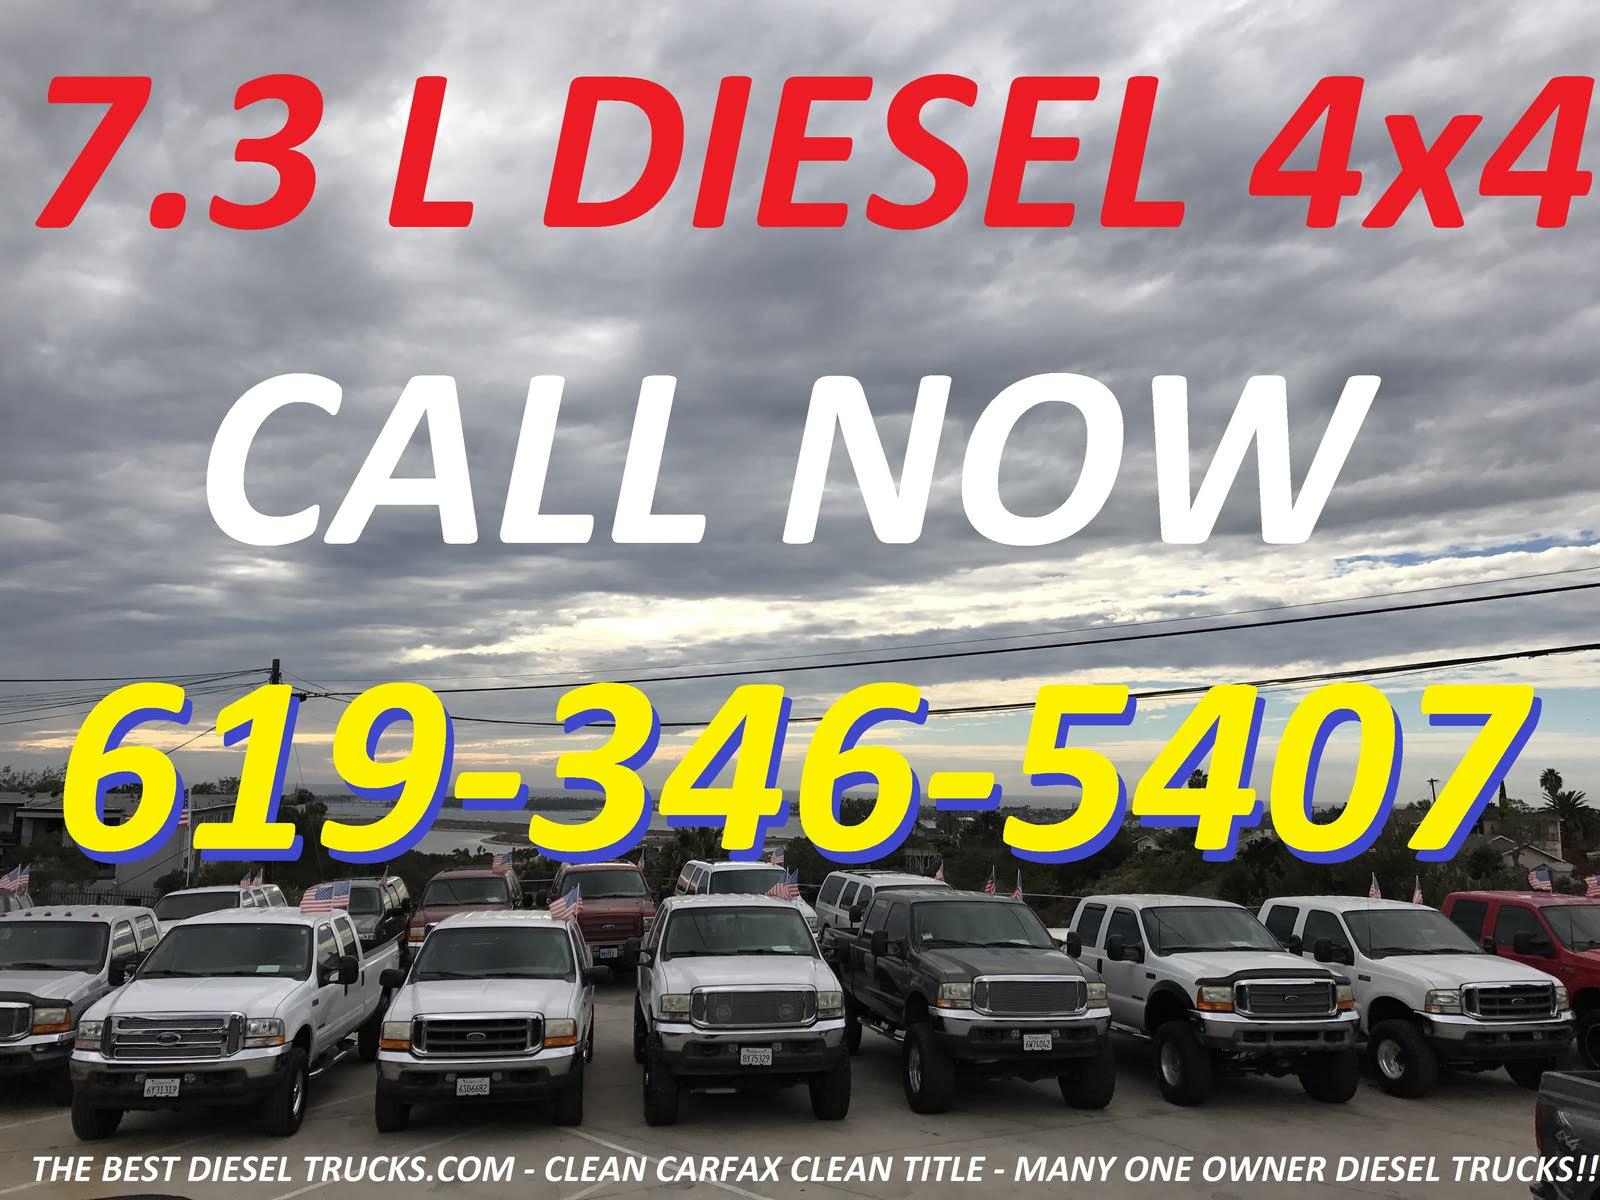 Jeep Dealership San Diego >> BRIDGEPOINT AUTO GROUP - San Diego, CA: Read Consumer ...